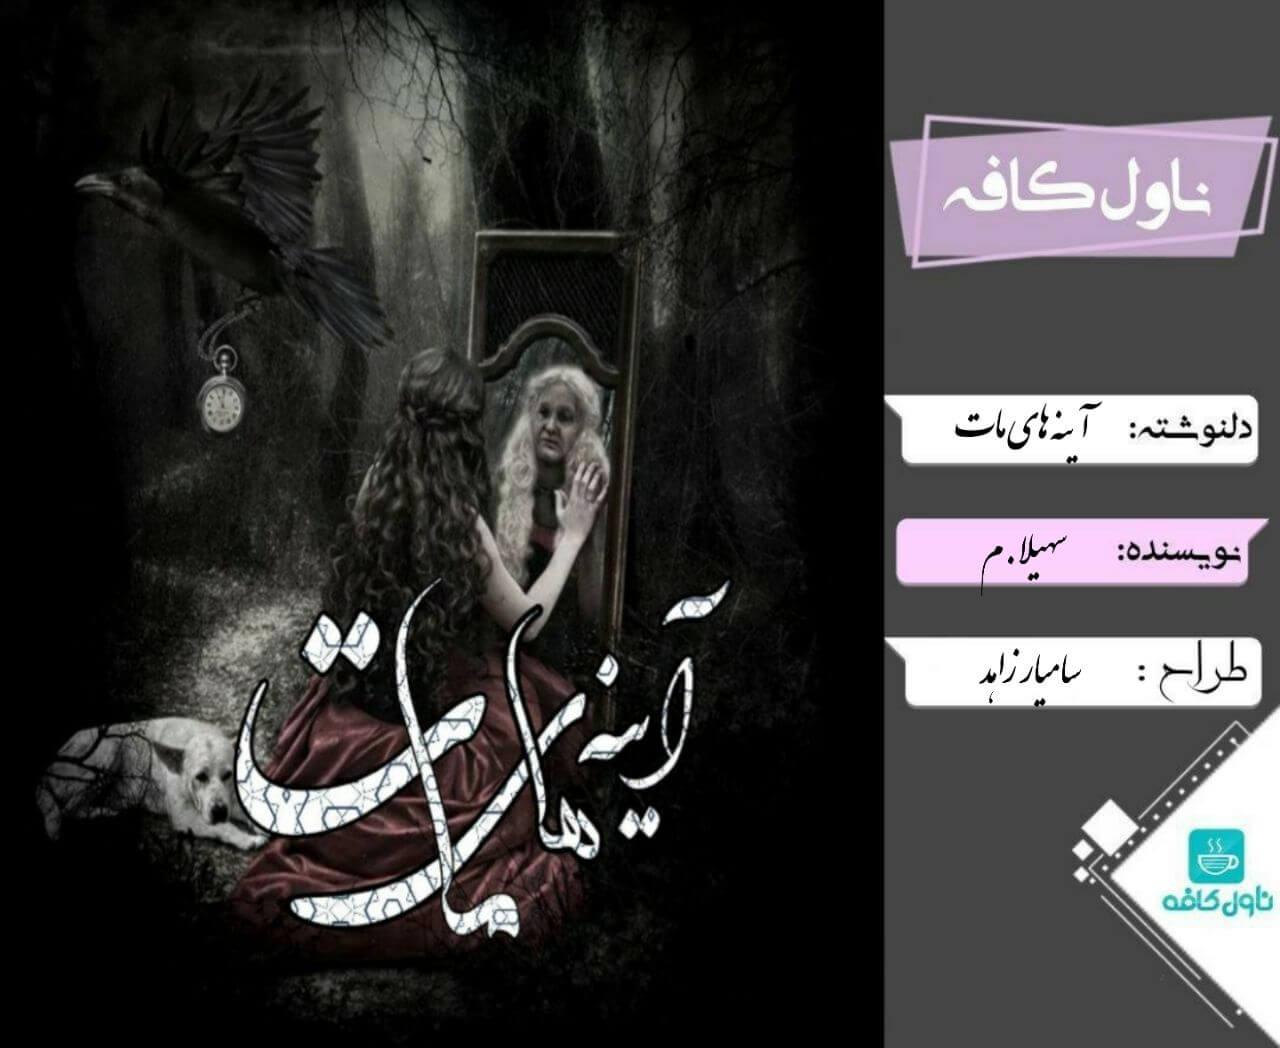 دلنوشته آینه های مات اثر سهیلا.م کاربر انجمن ناول کافه